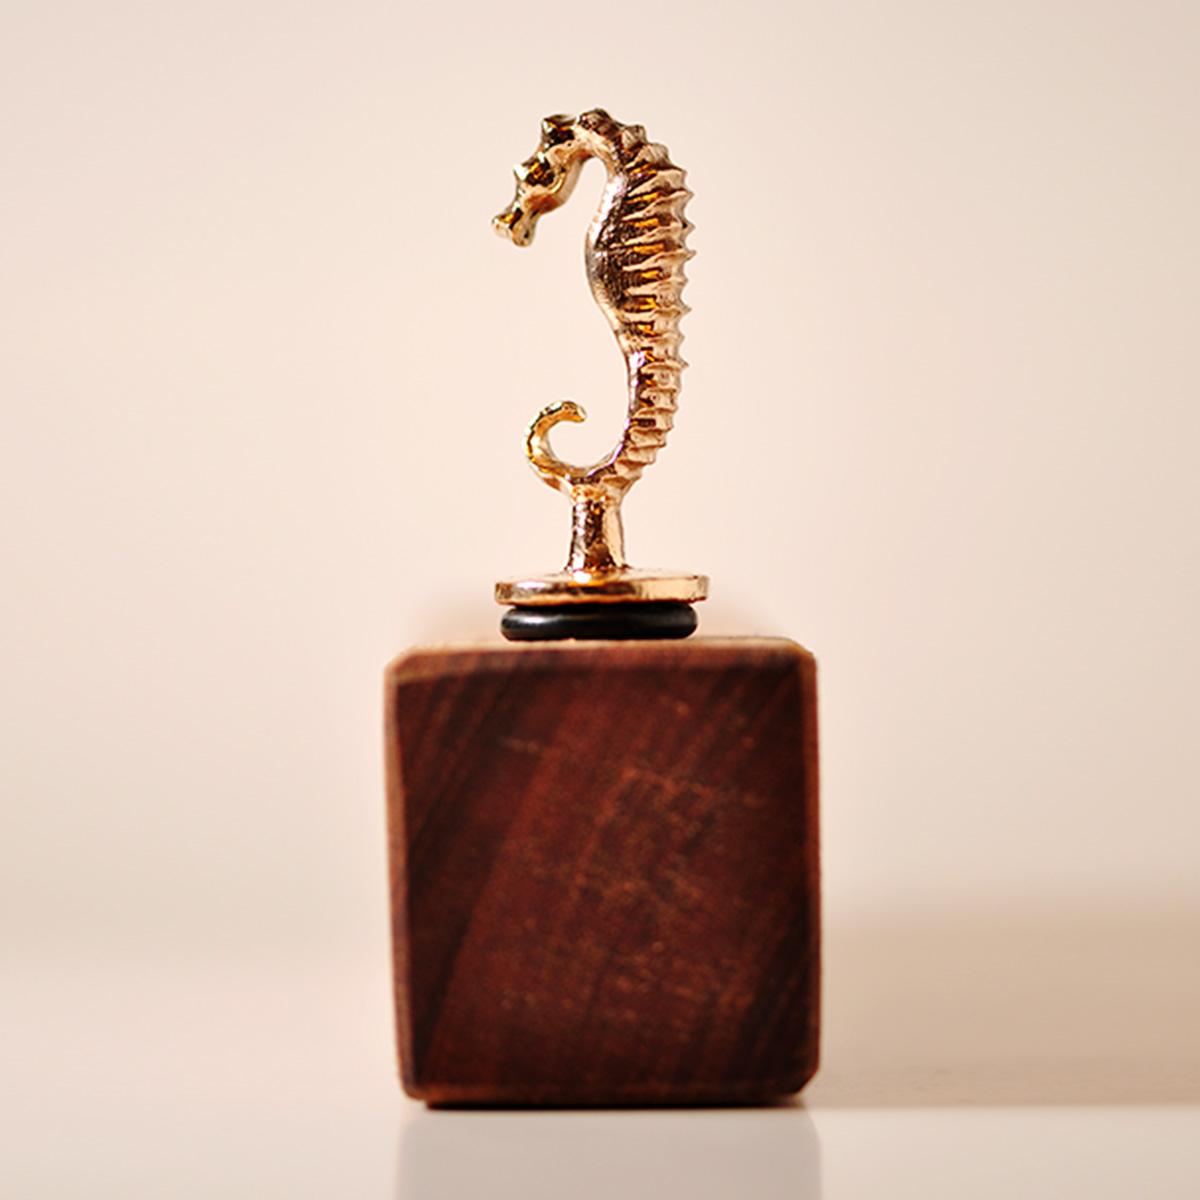 Vinprop i bronze. Søhest